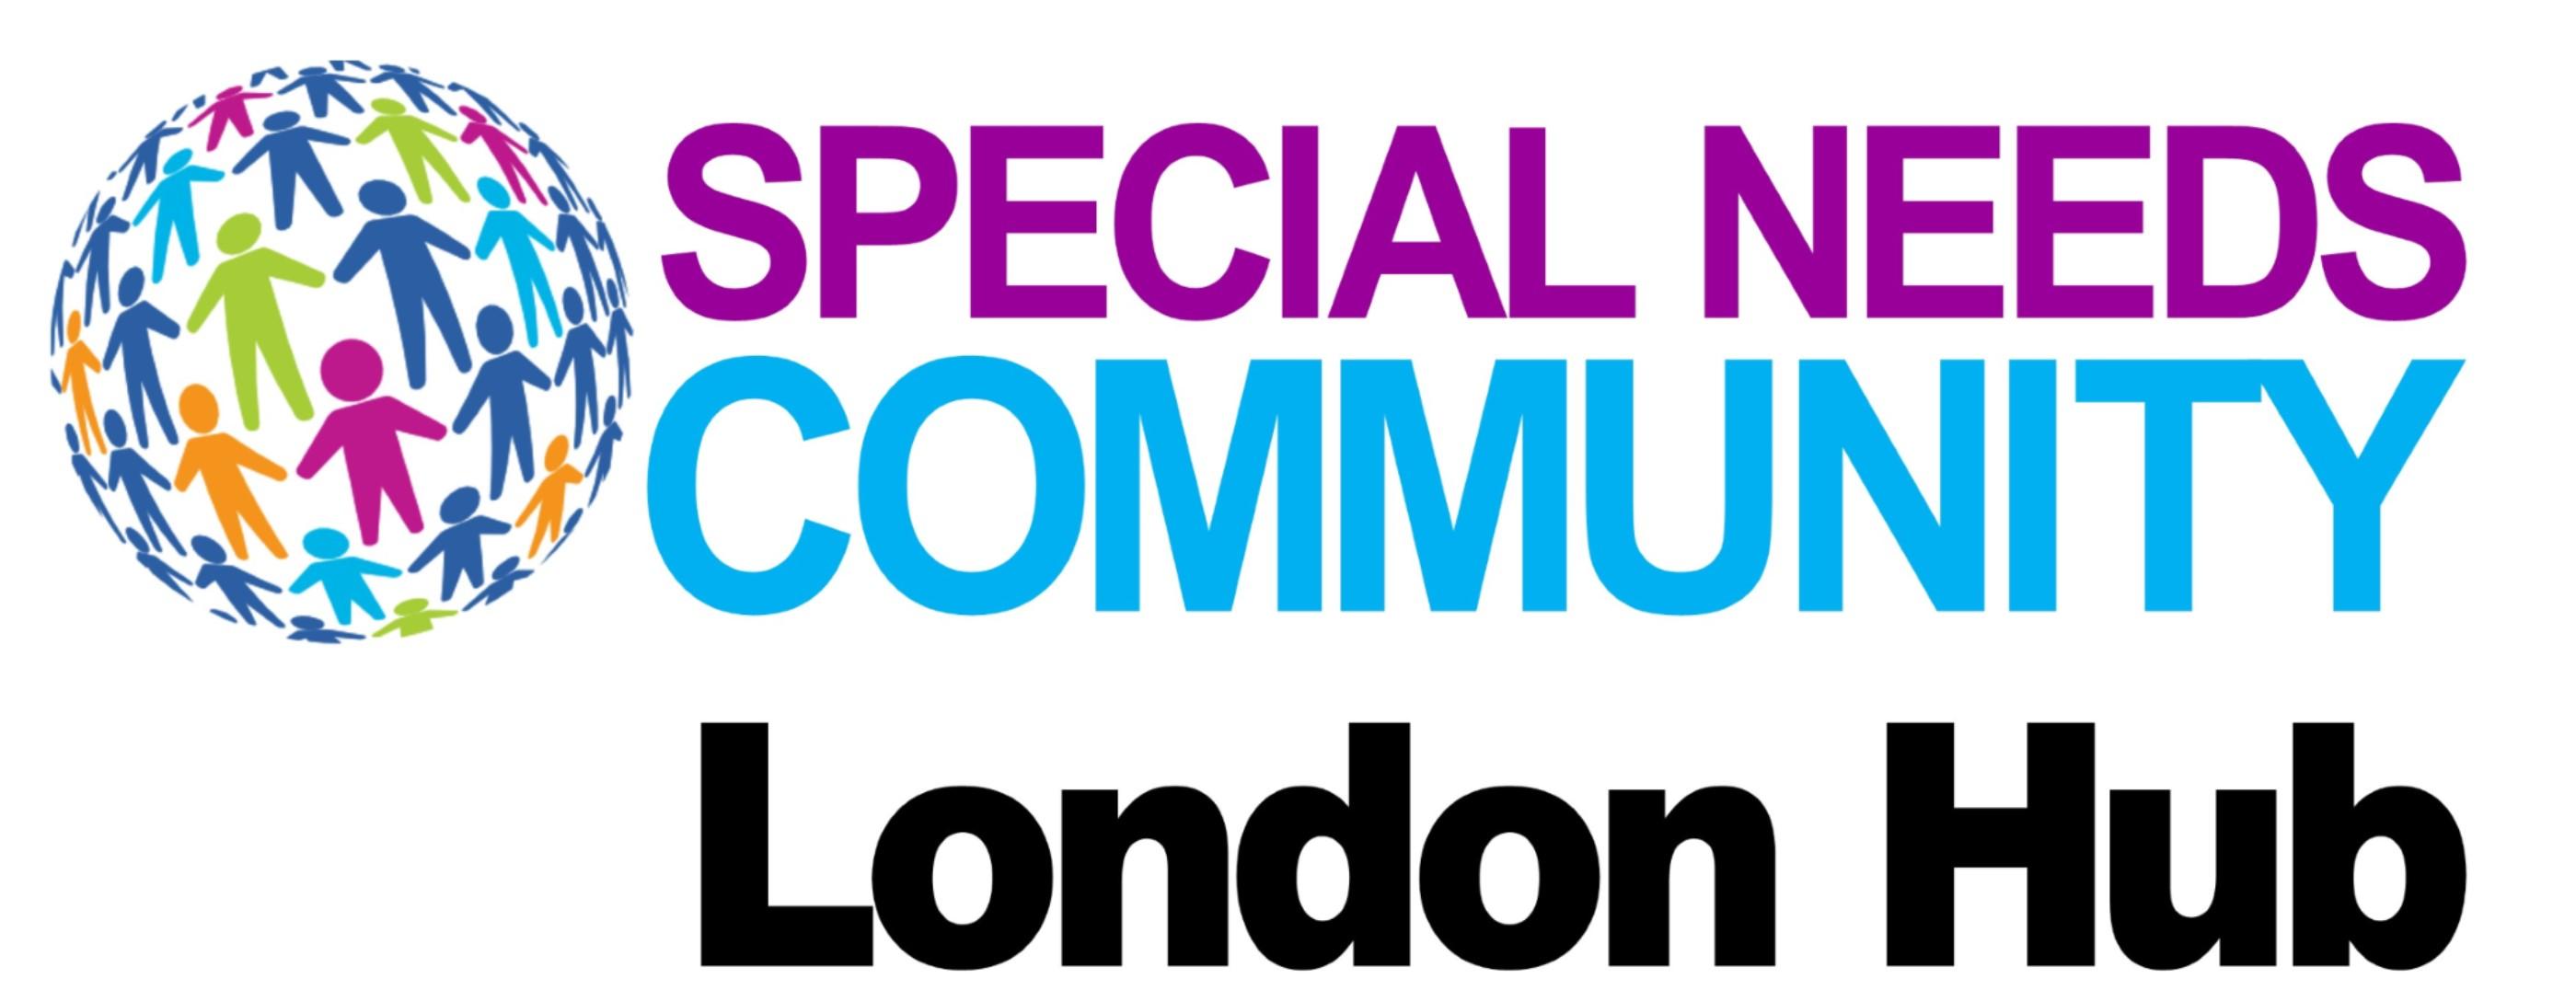 SPECIAL NEEDS COMMUNITY LONDON HUB